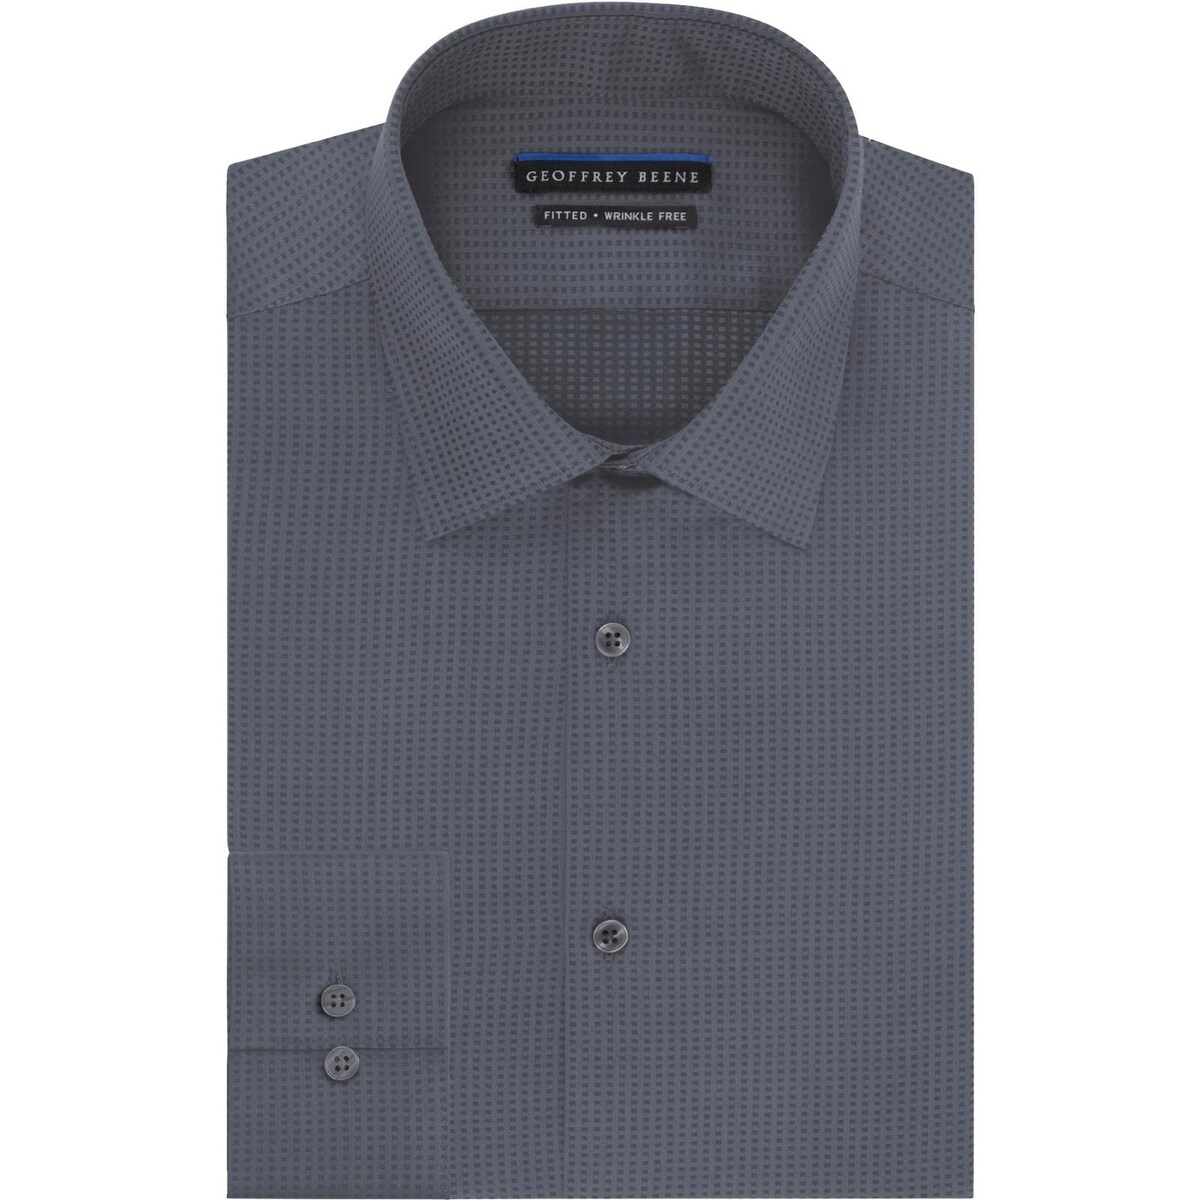 Shop Geoffrey Beene Mens Dress Shirt Shadow Stripe Classic Fit